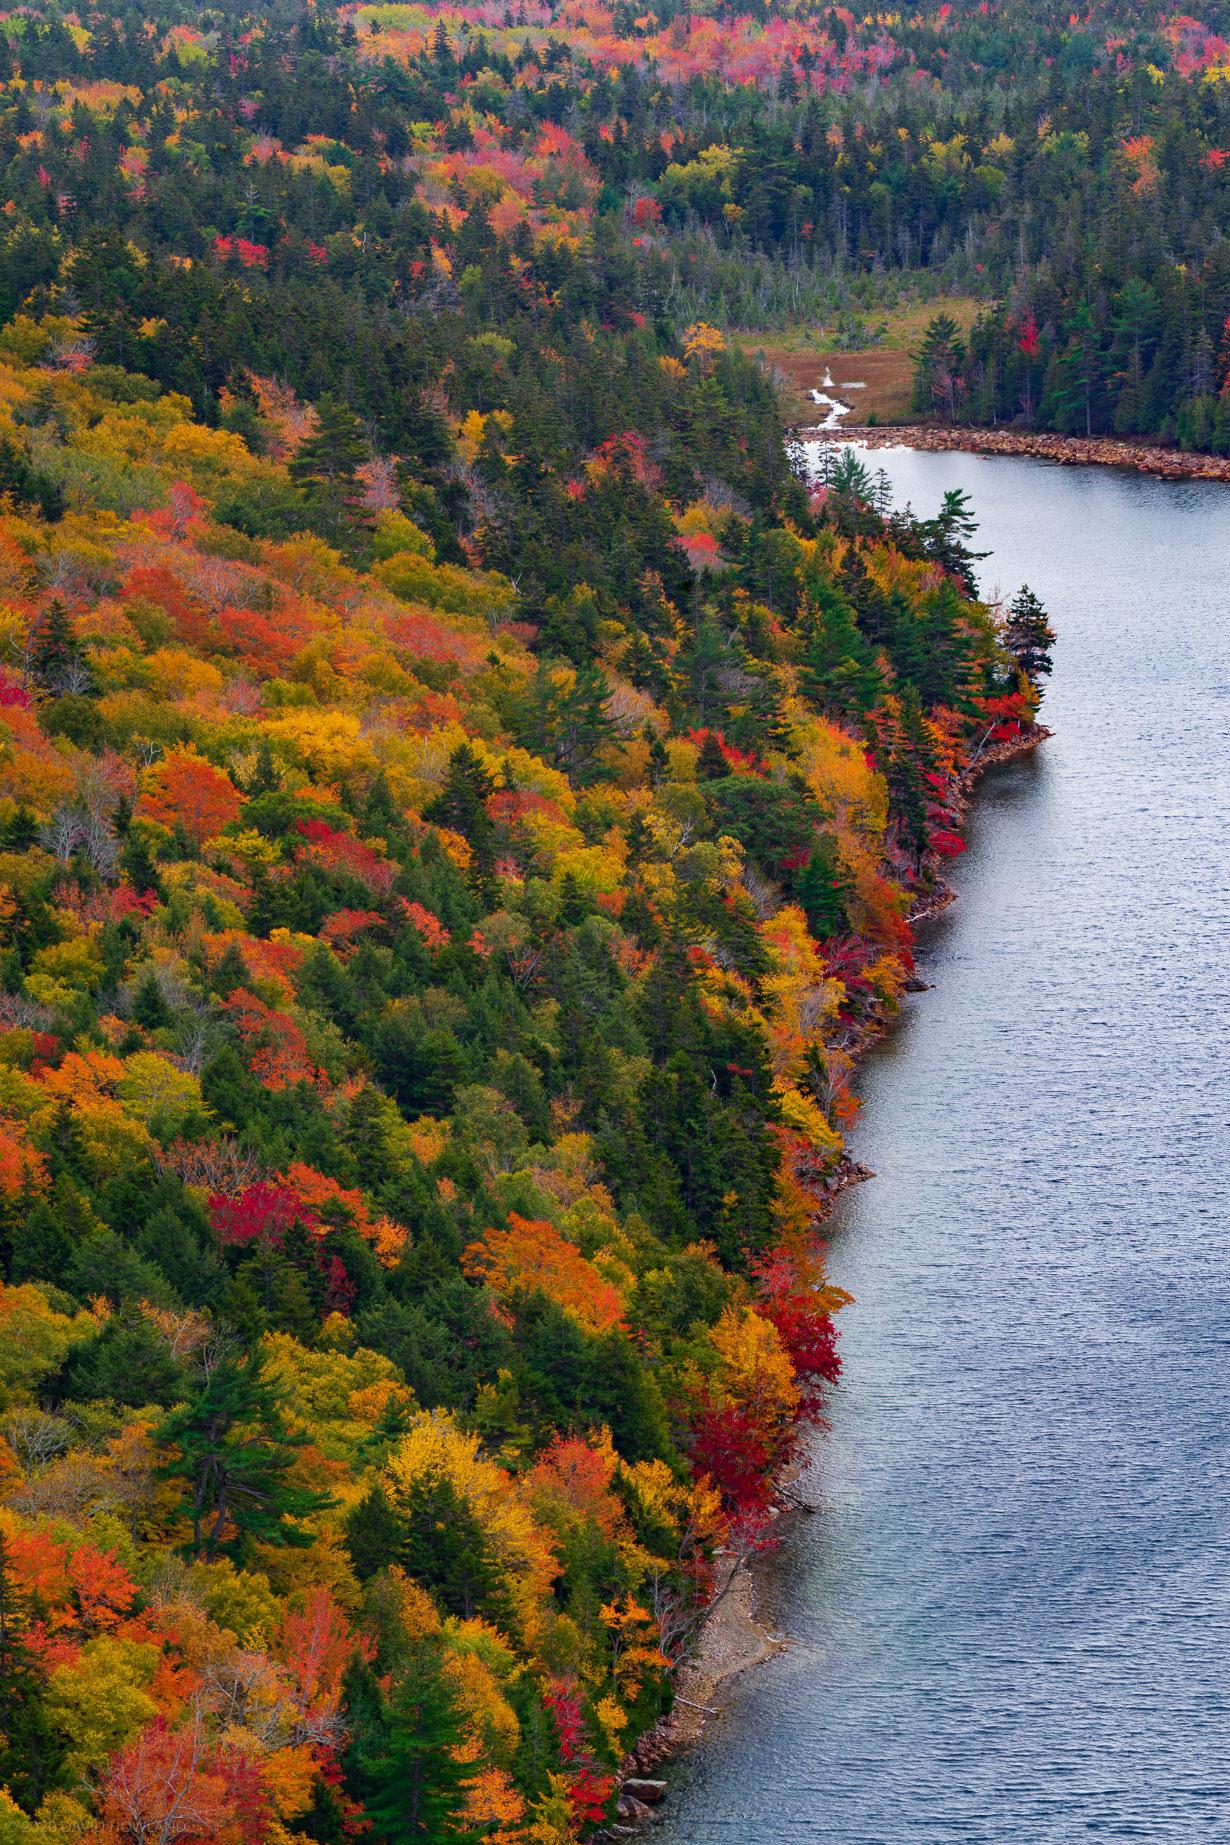 Fall Foliage at Jordan Pond